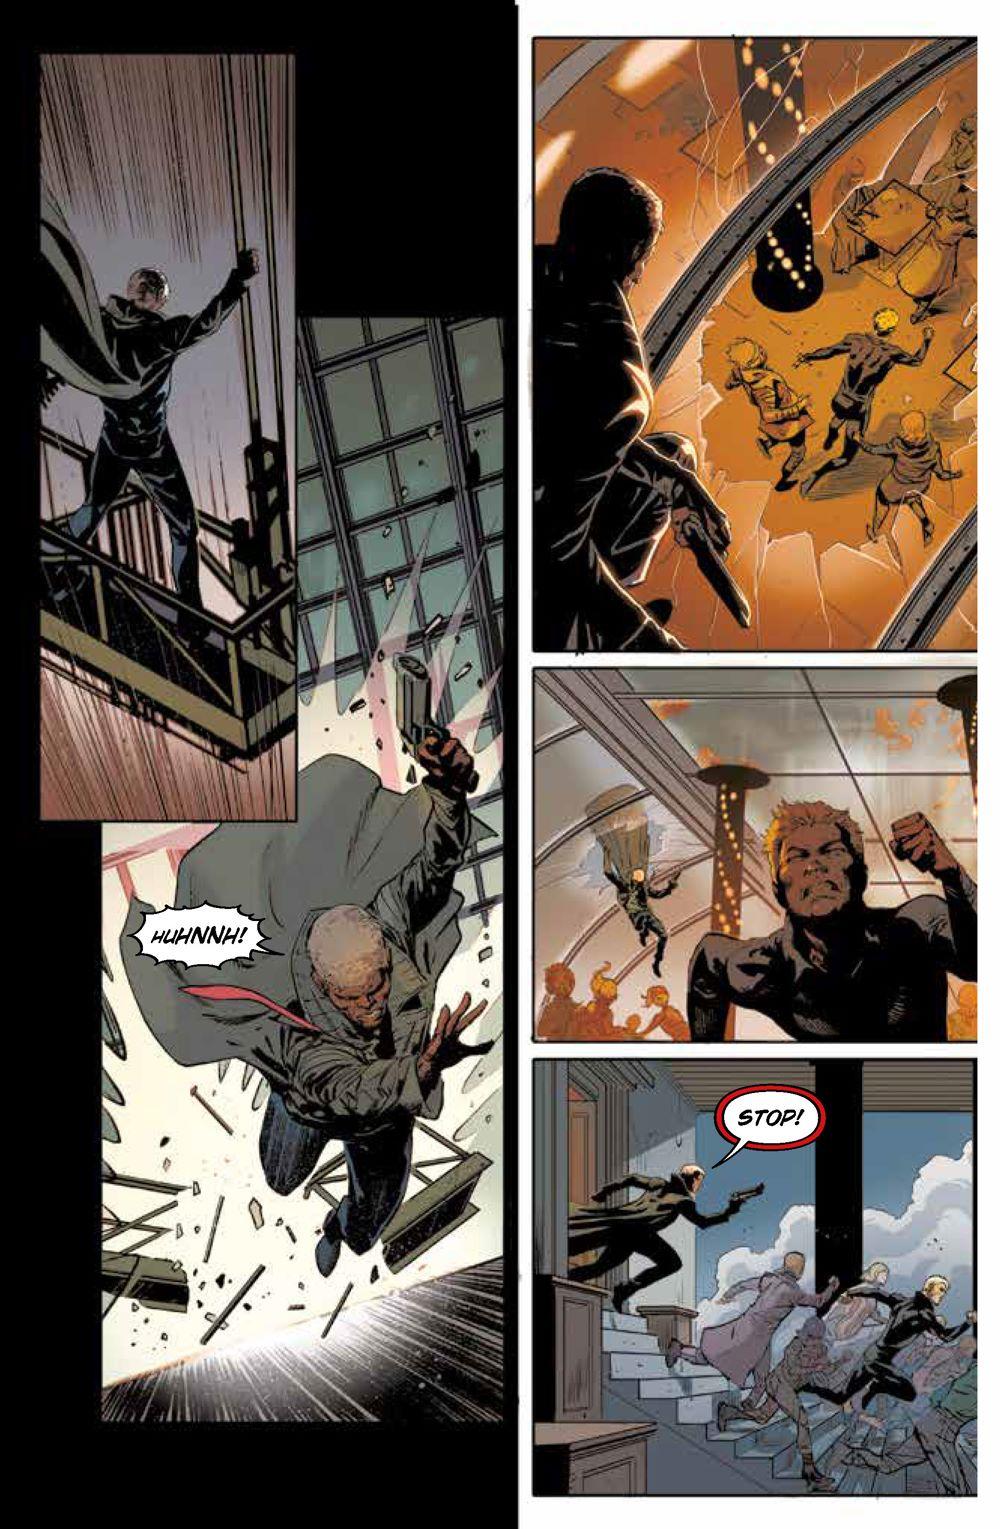 Blade_Runner_Origins_4_INT_Page_3 ComicList Previews: BLADE RUNNER ORIGINS #4